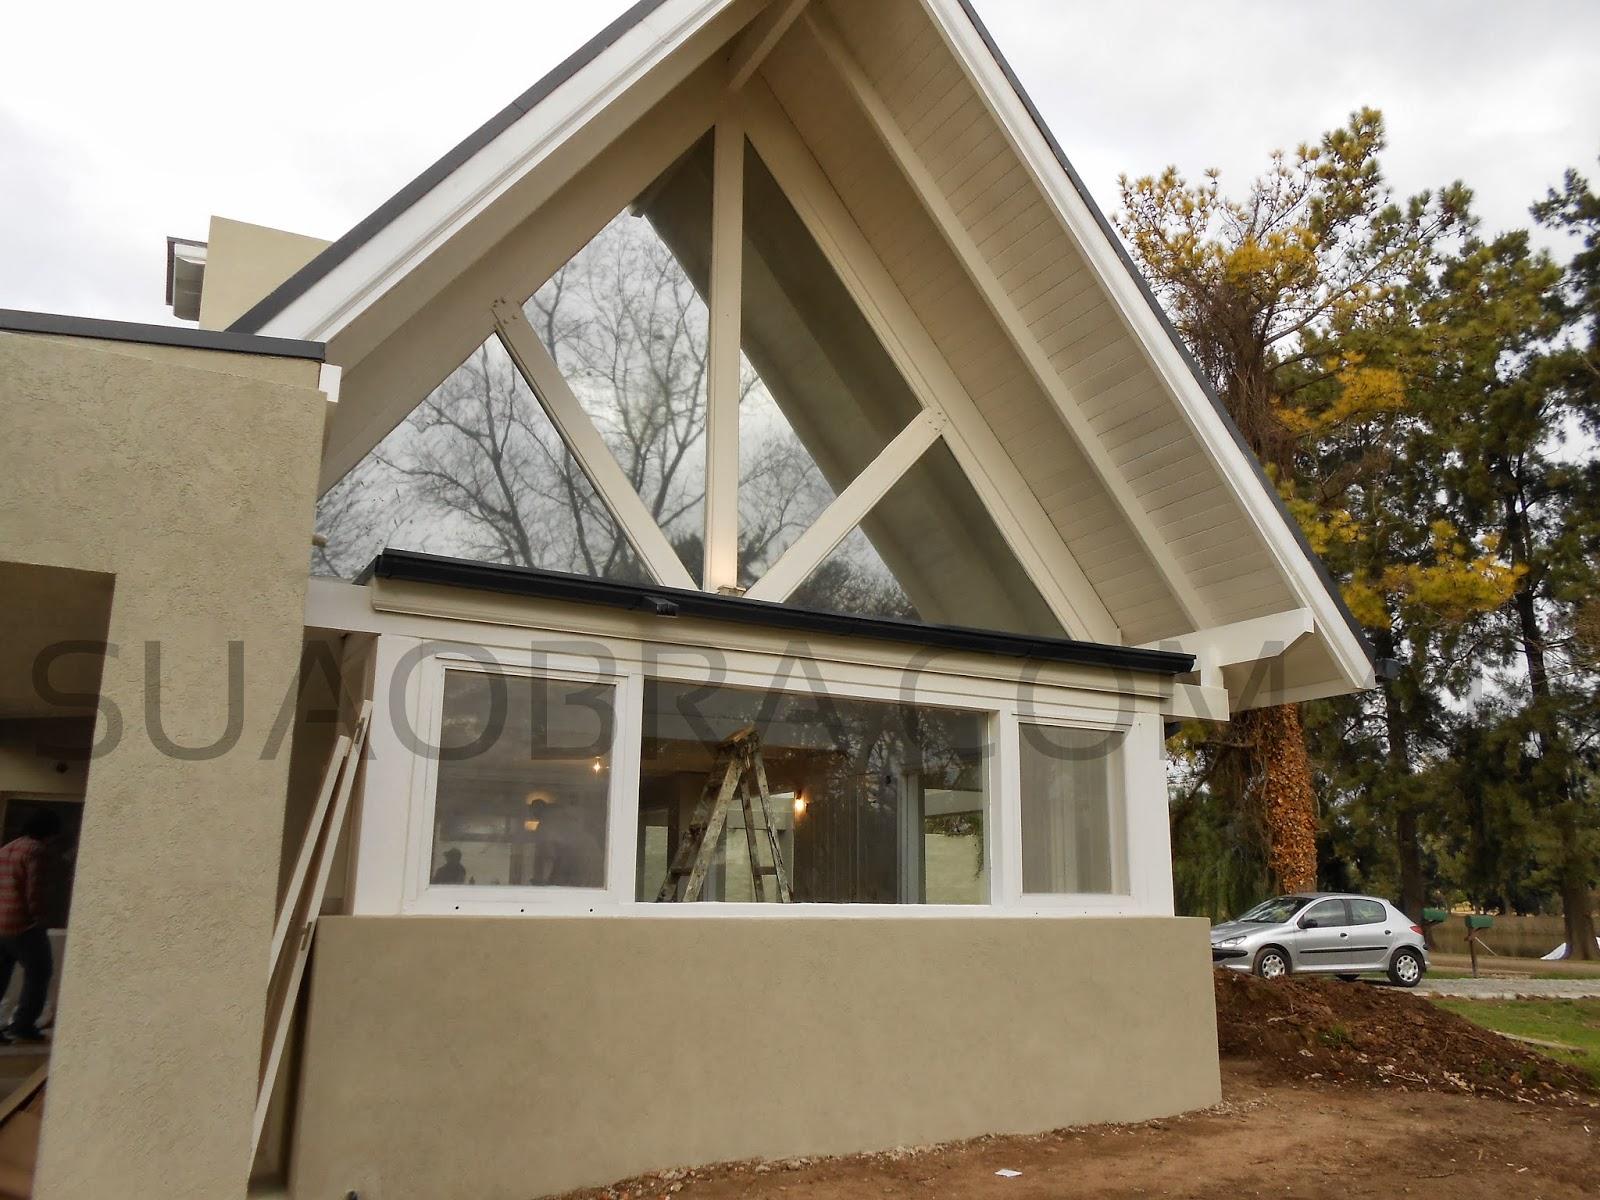 Revestimiento pl stico quimtex revear para paredes for Revestimientos para exteriores